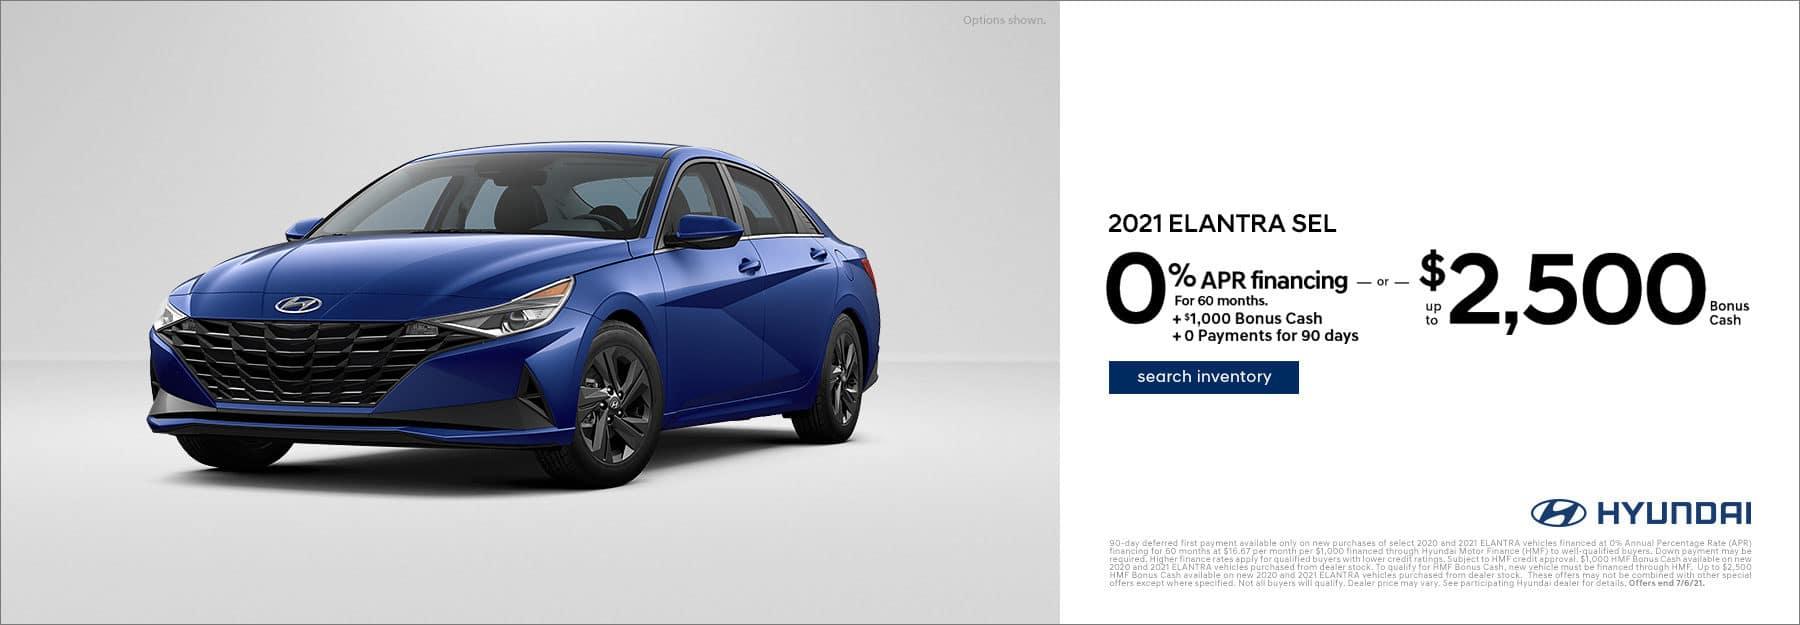 Hyundai 2021 Elantra Offer 1000 off